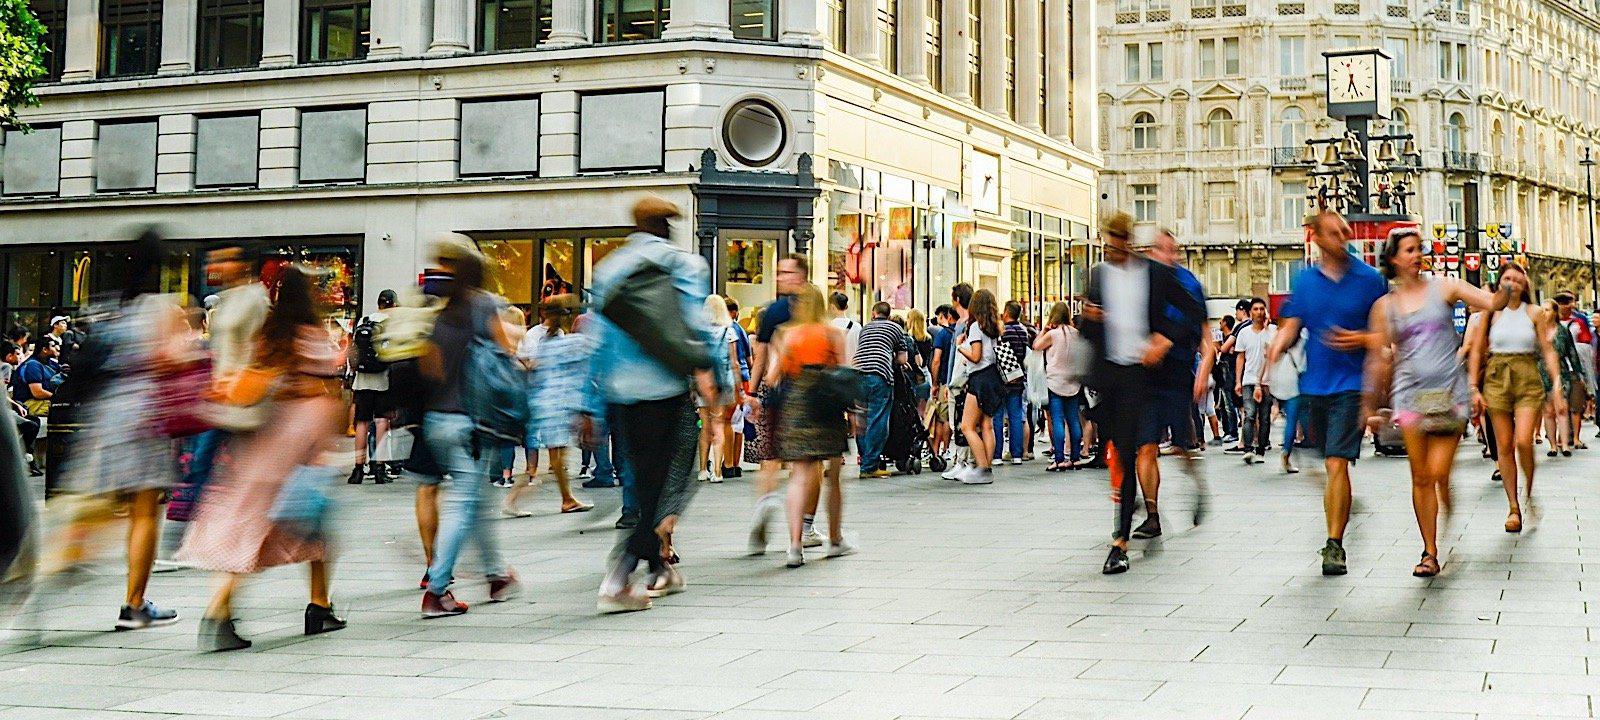 Shopper Behavior